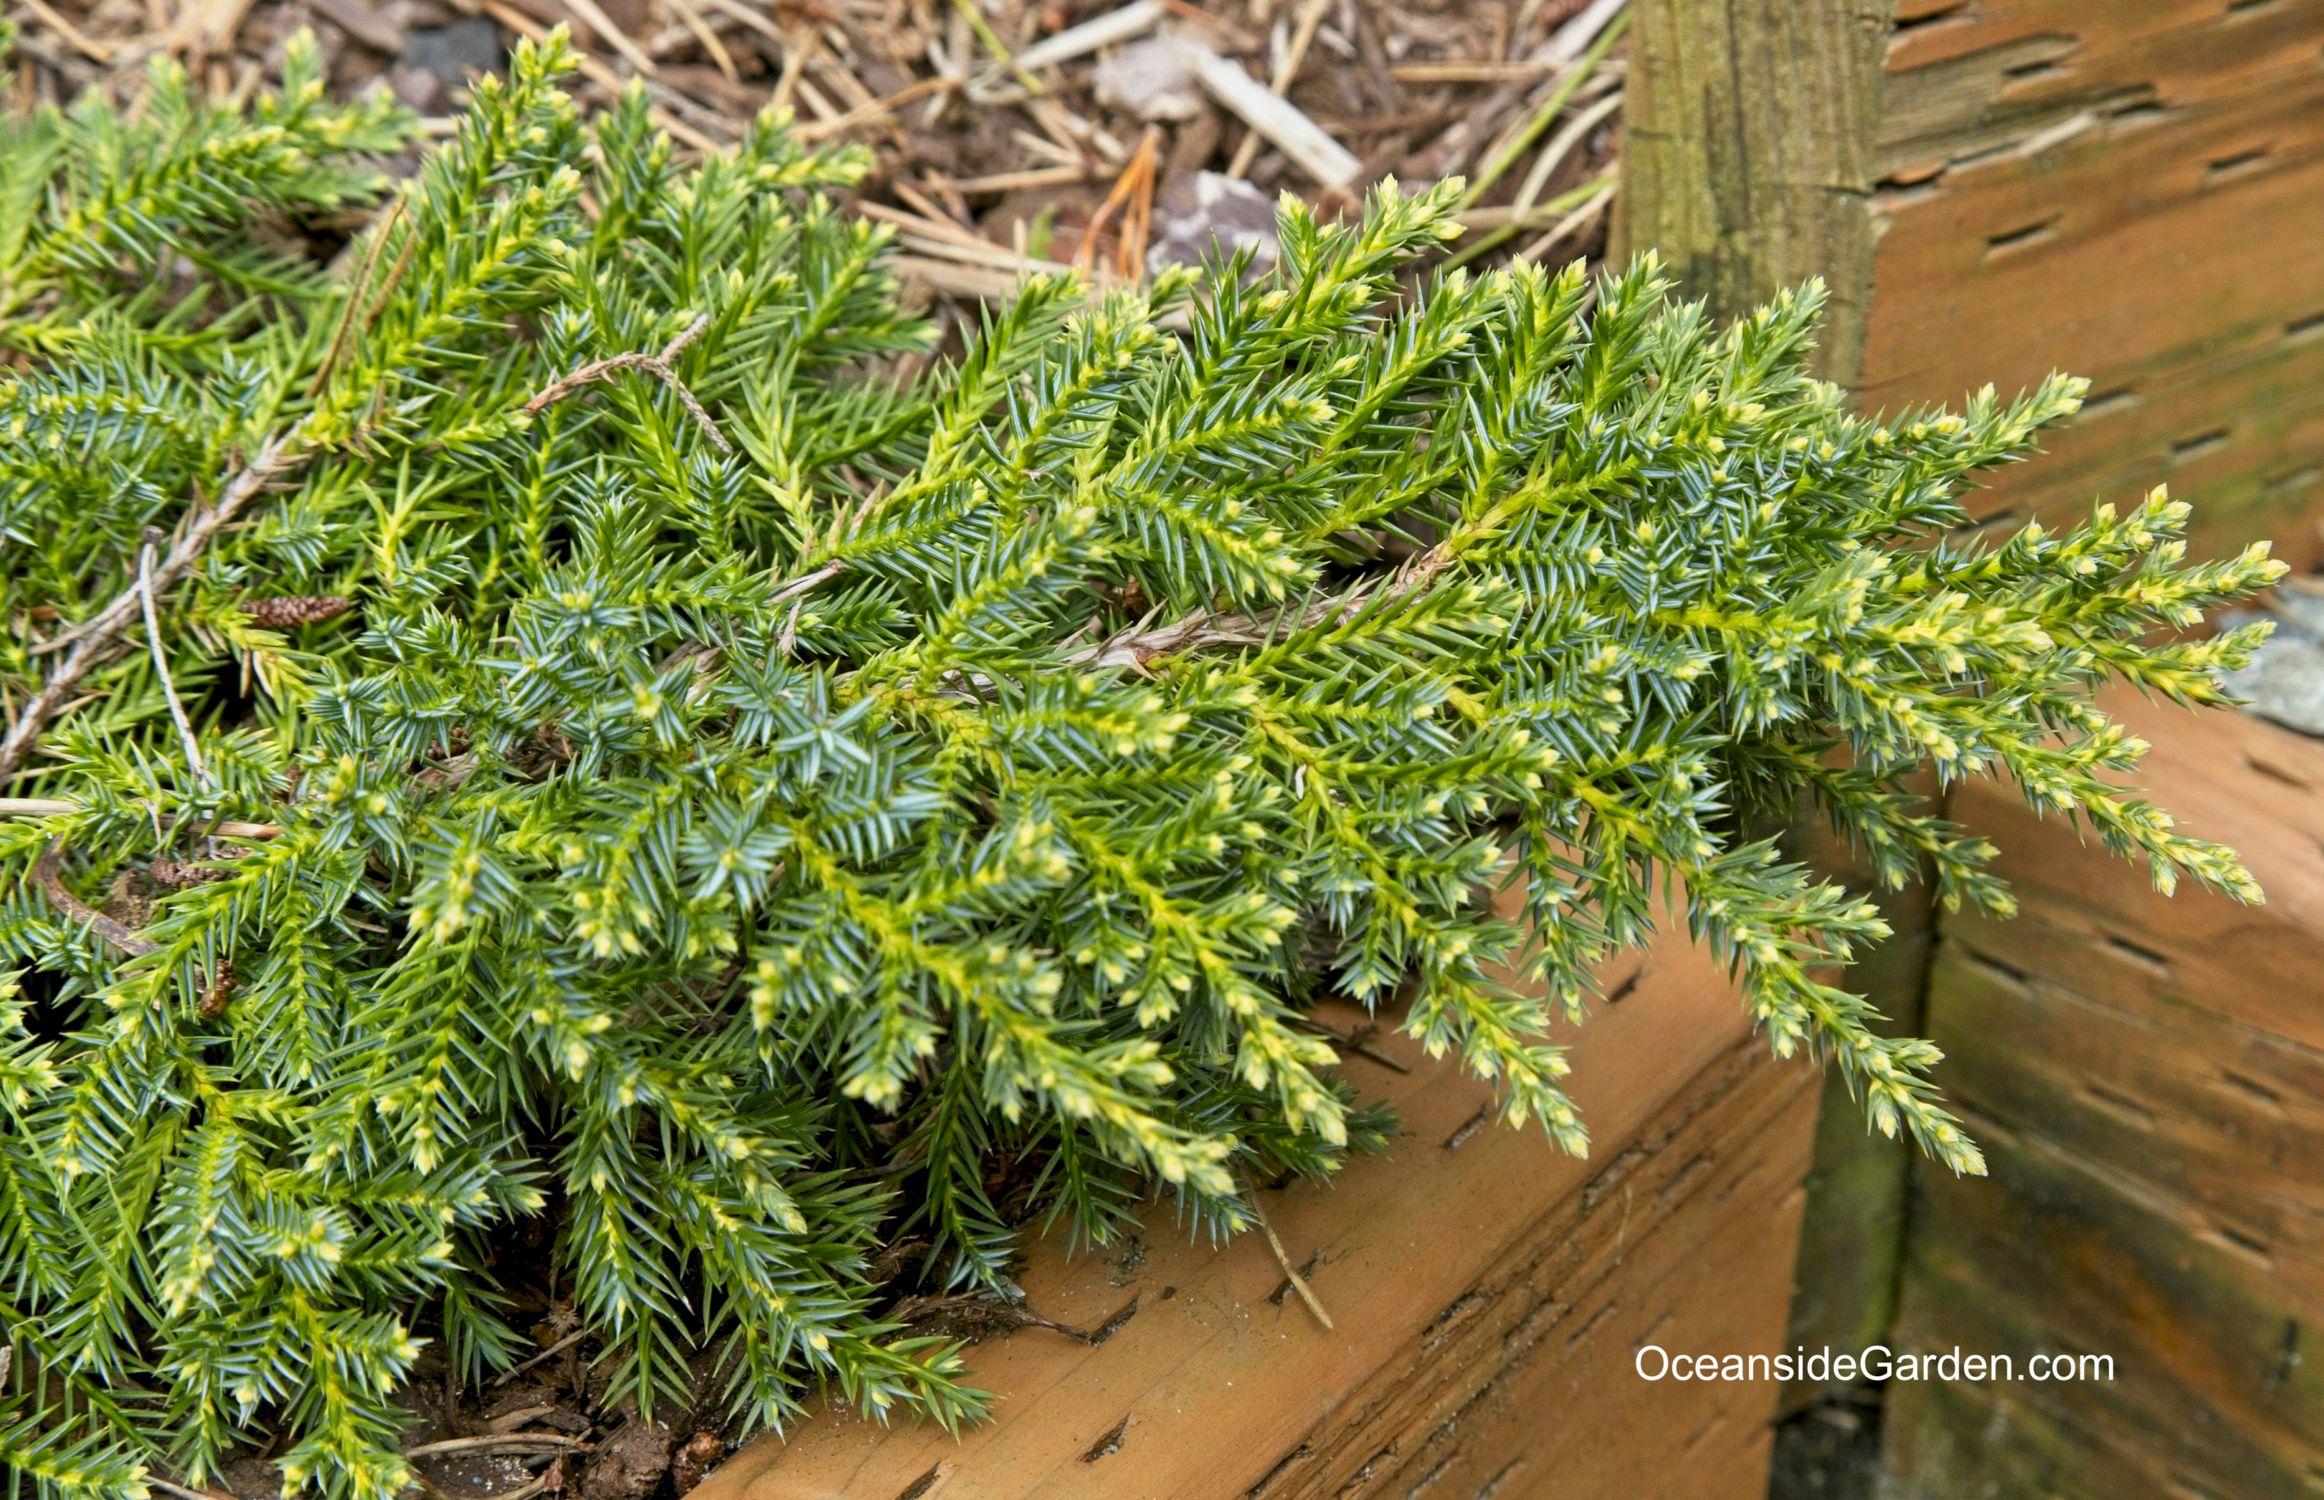 Juniperus x pfitzeriana 'Daub's Frosted'